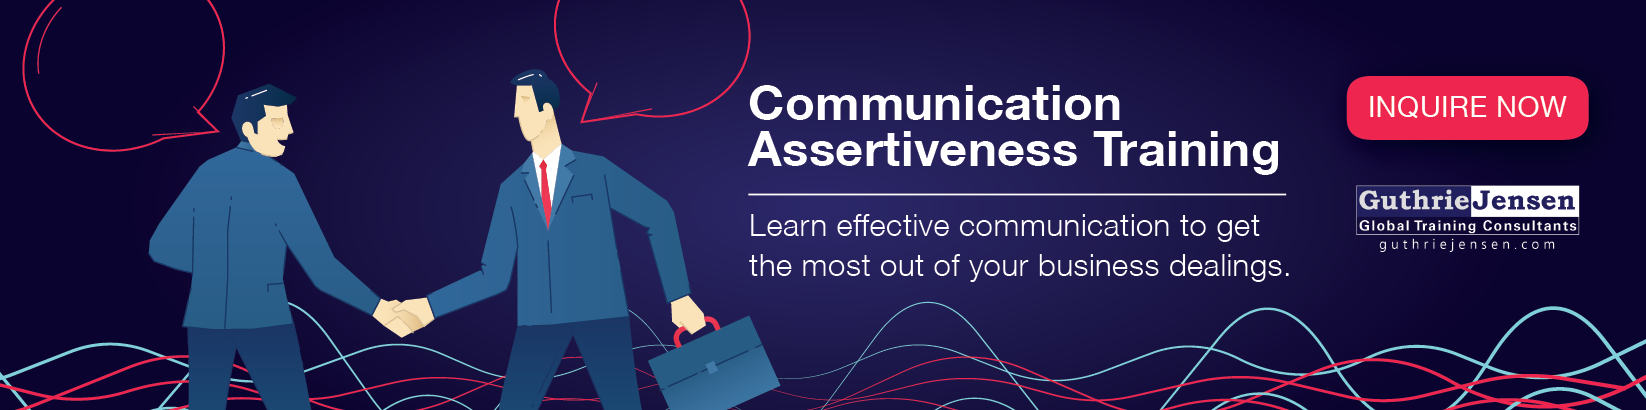 Communication Assertiveness Training